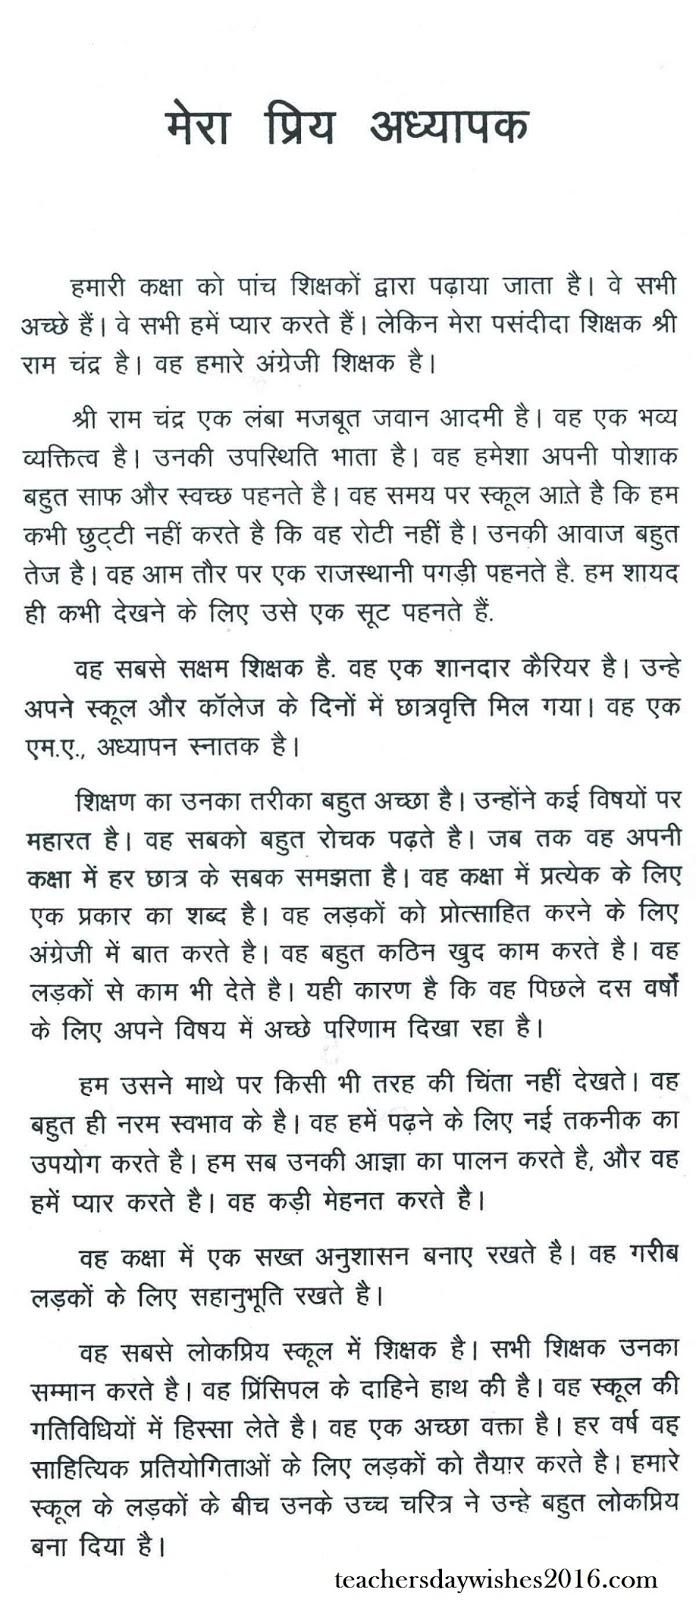 013 Essay On Teacher Example 10005 Thumb Marvelous Teachers Day In Odia Argumentative Carrying Guns Importance Hindi Full